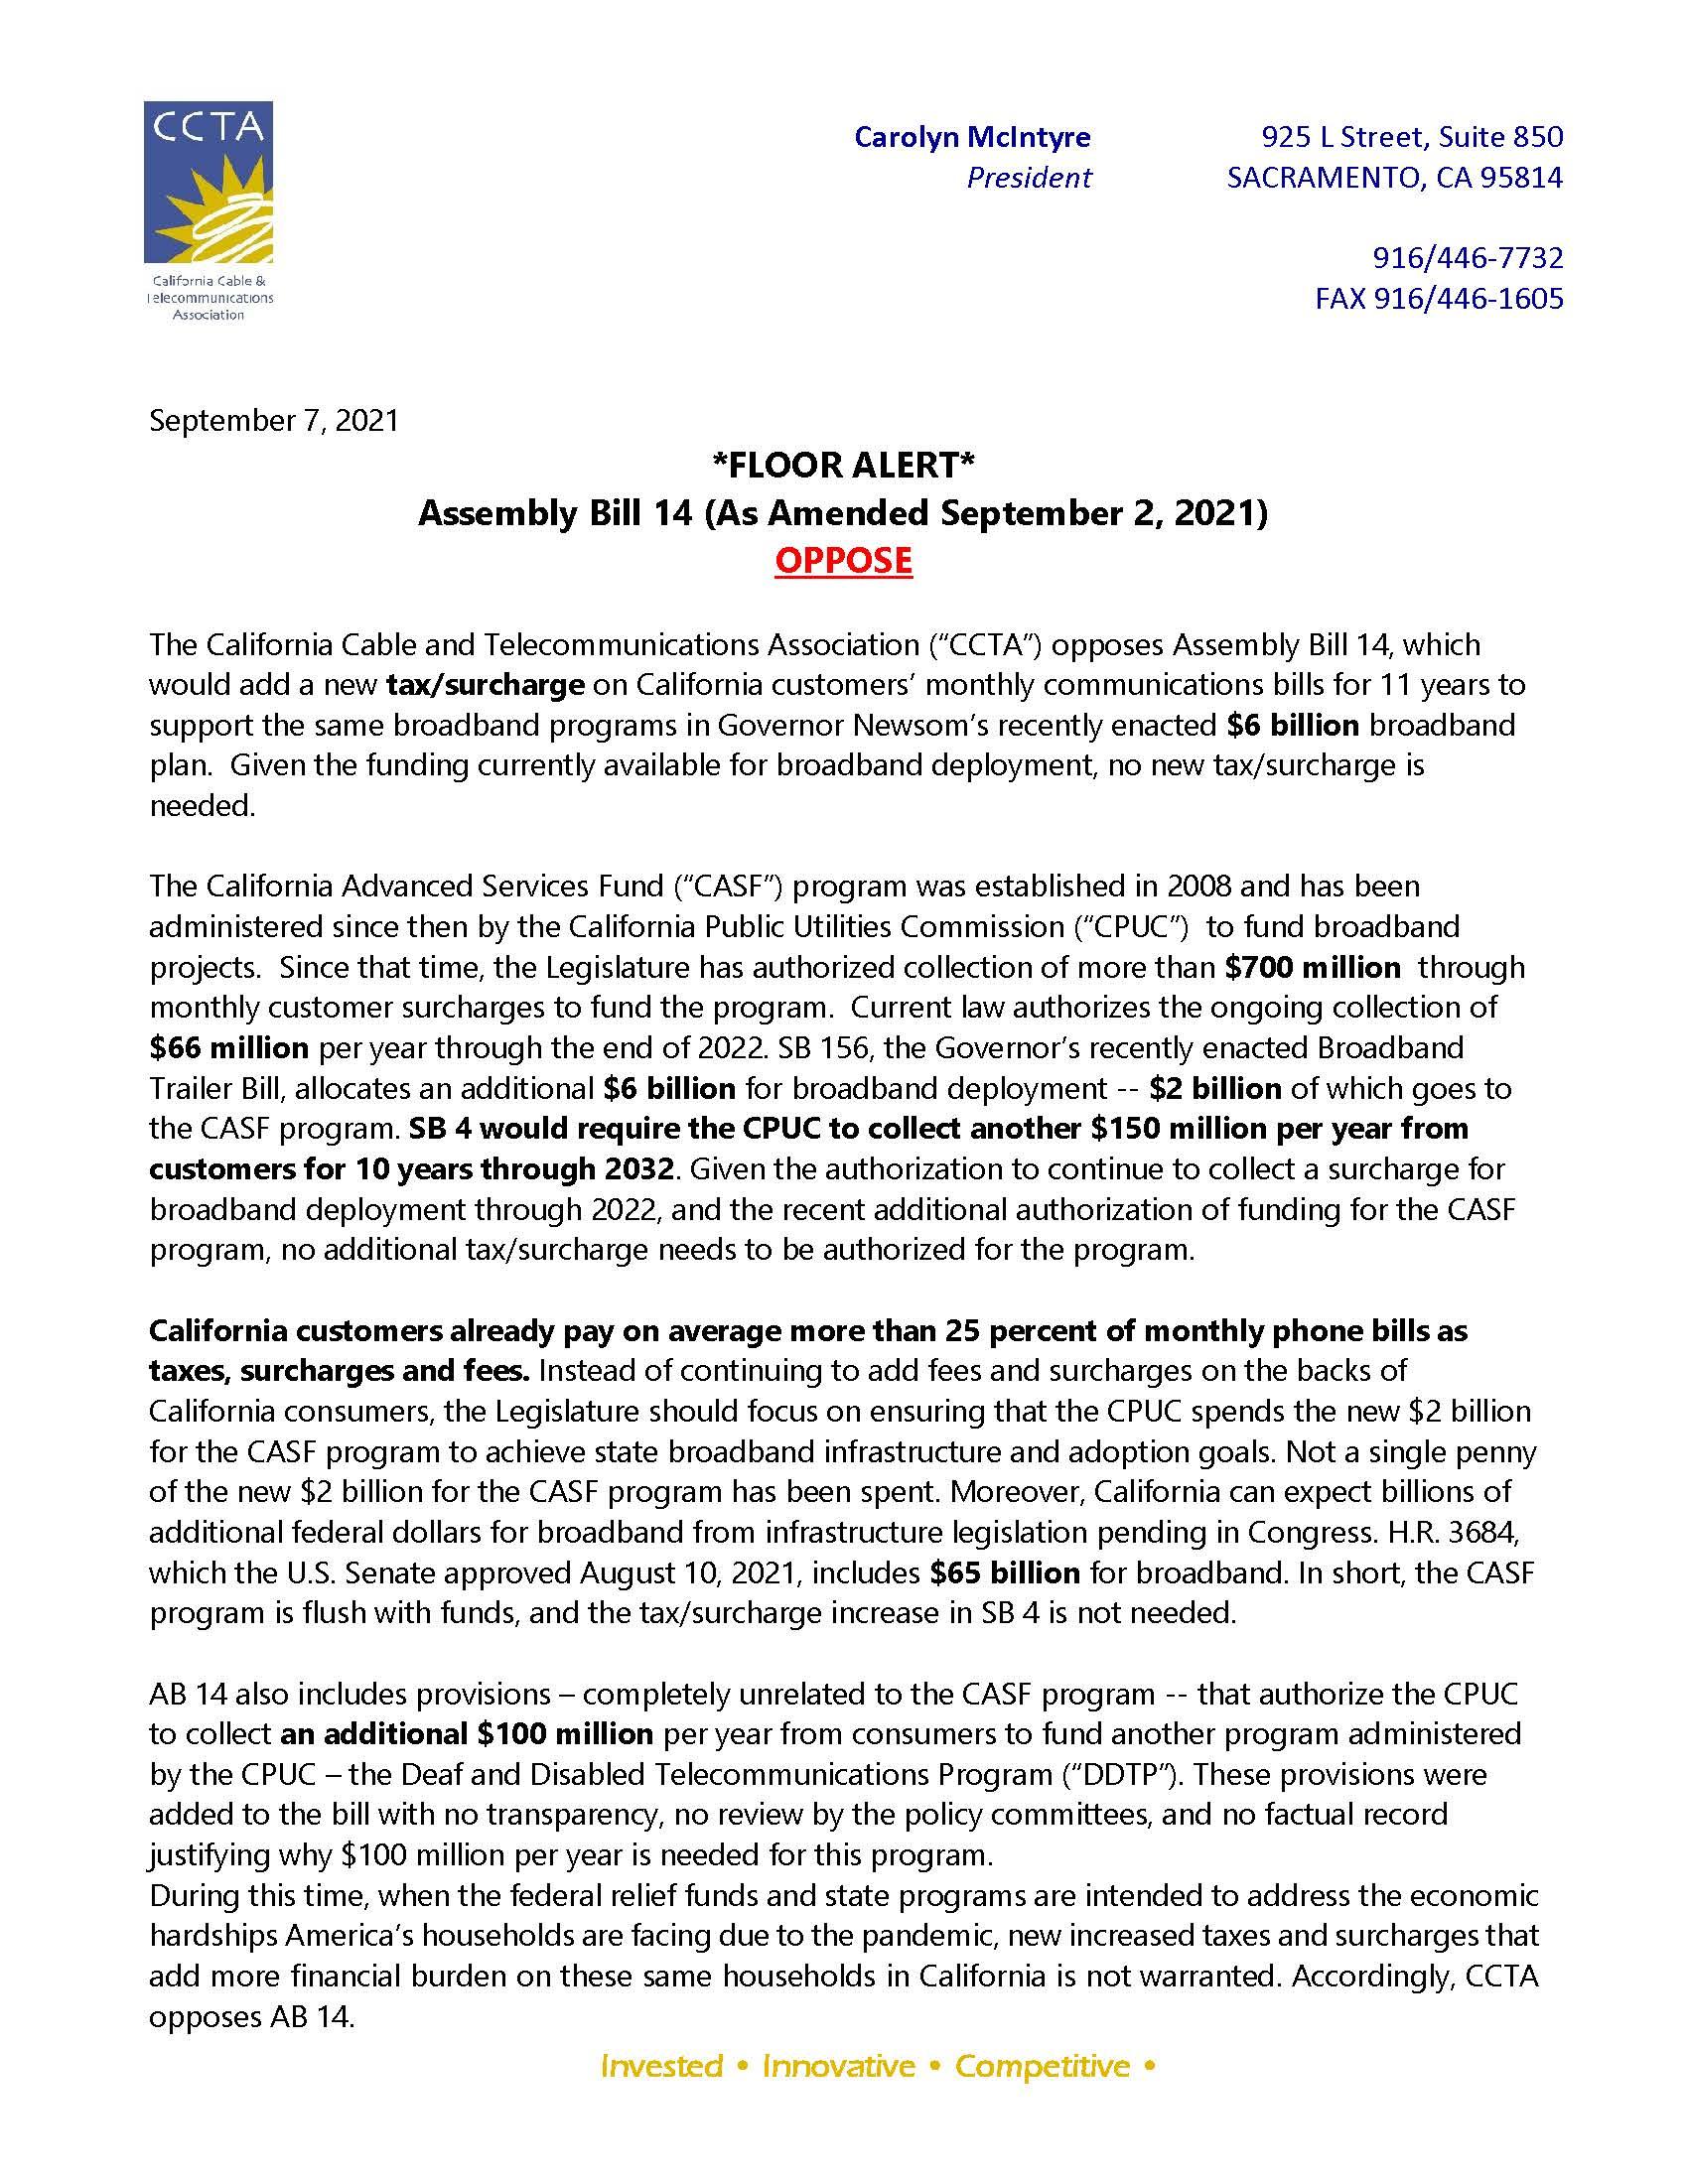 AB 14 (A Curry) CCTA Opposition Floor Alert 9.7.21